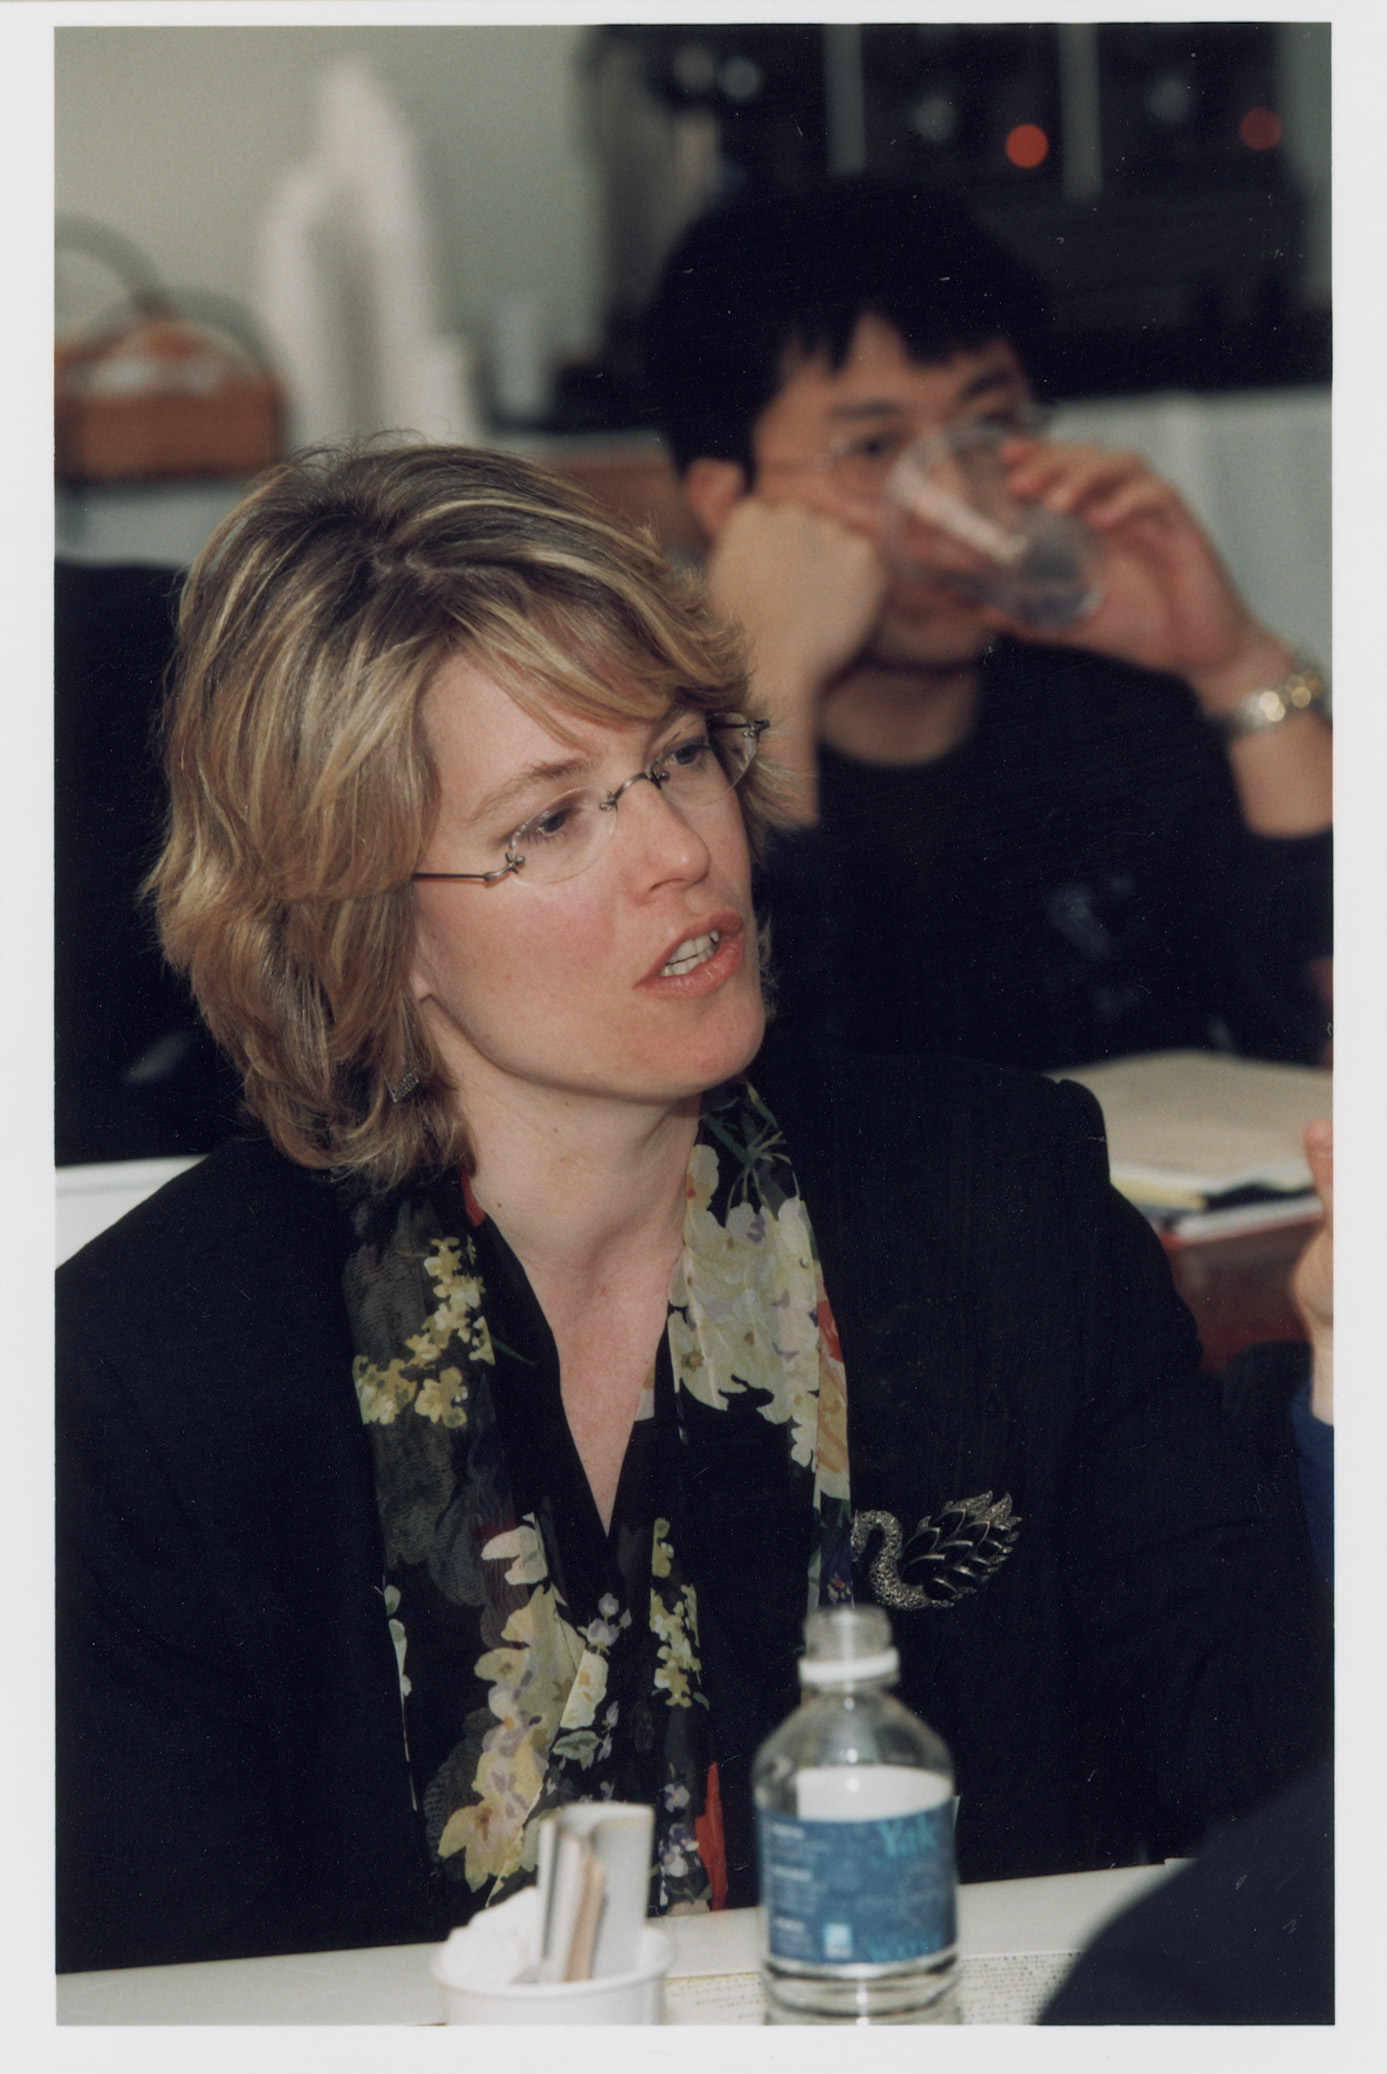 U. of Southern Cal. Law Prof. and Visiting YLS Prof. Jennifer Arlen